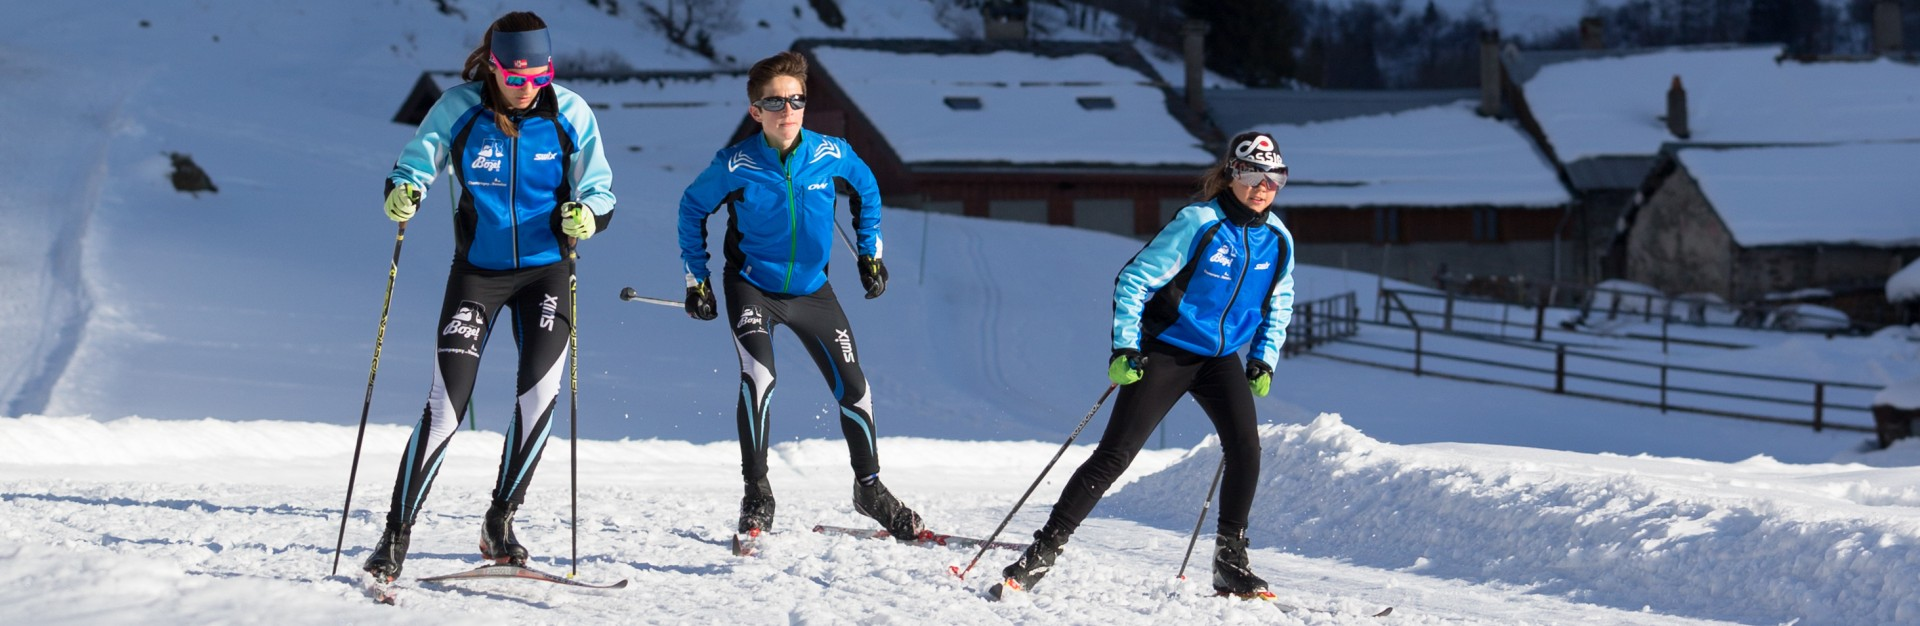 ski-de-fond Bozel